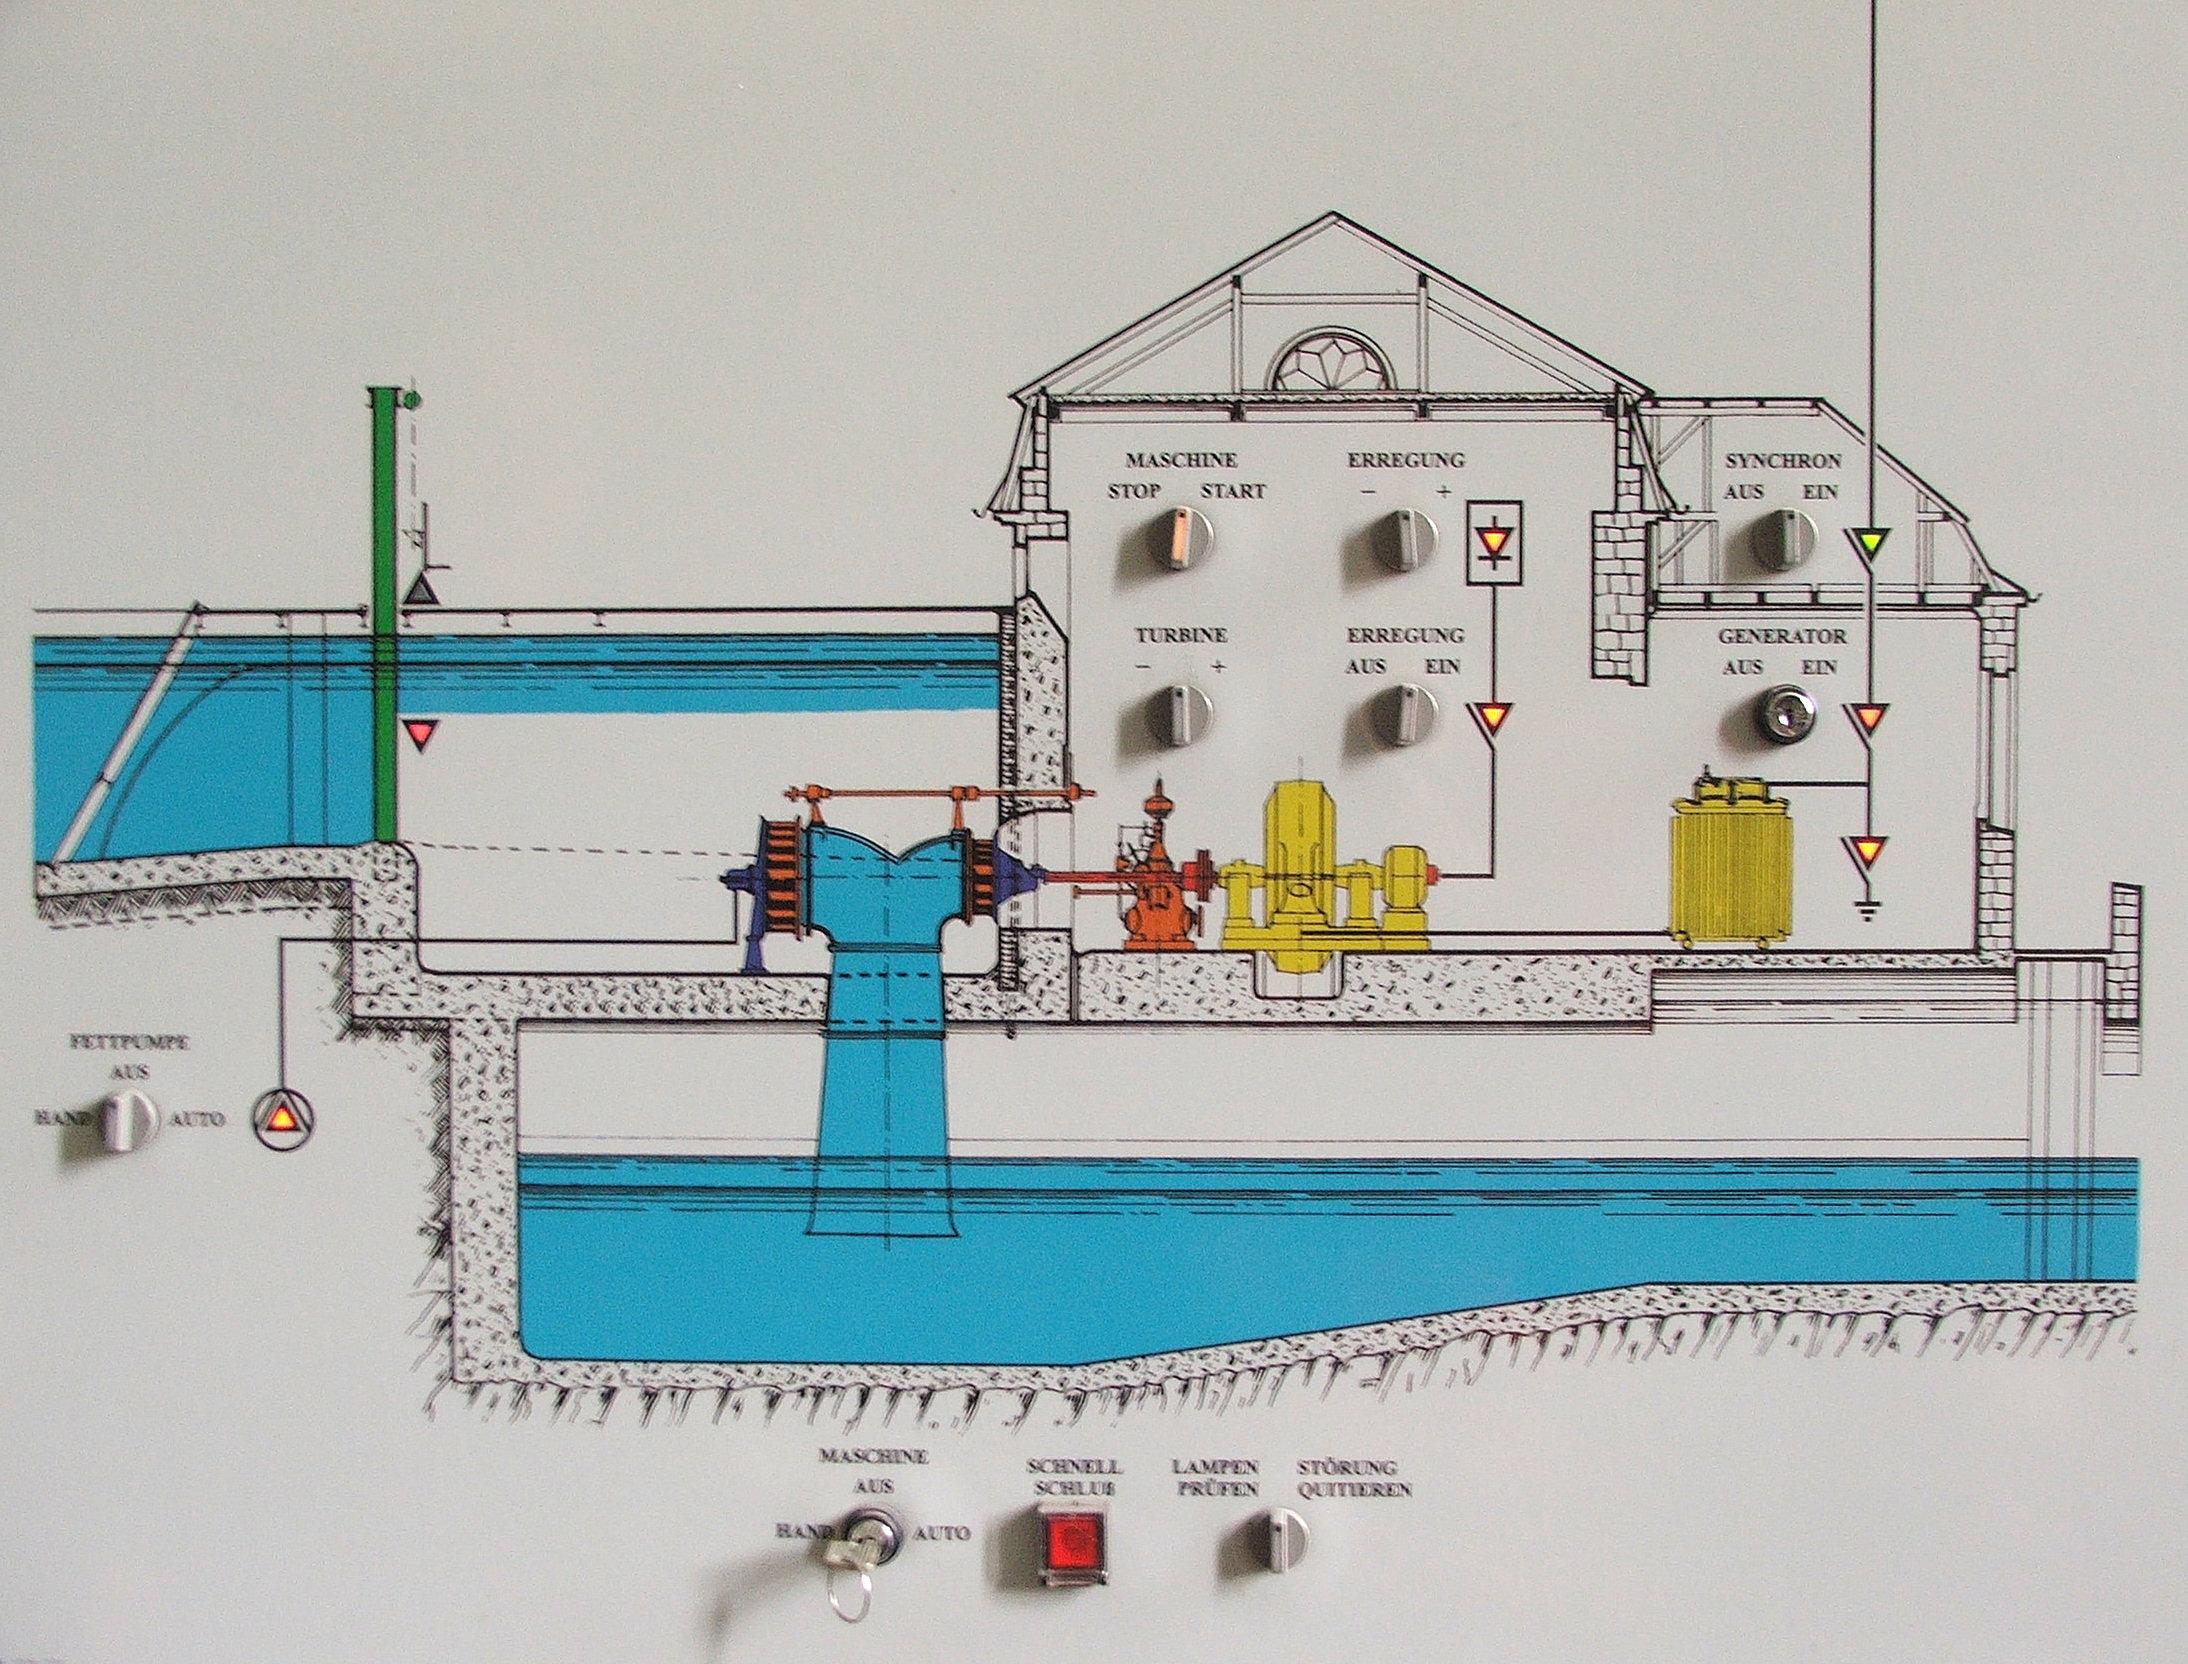 File:Laufwasserkraftwerk Bamenohl - Schalttafel.jpg - Wikimedia Commons